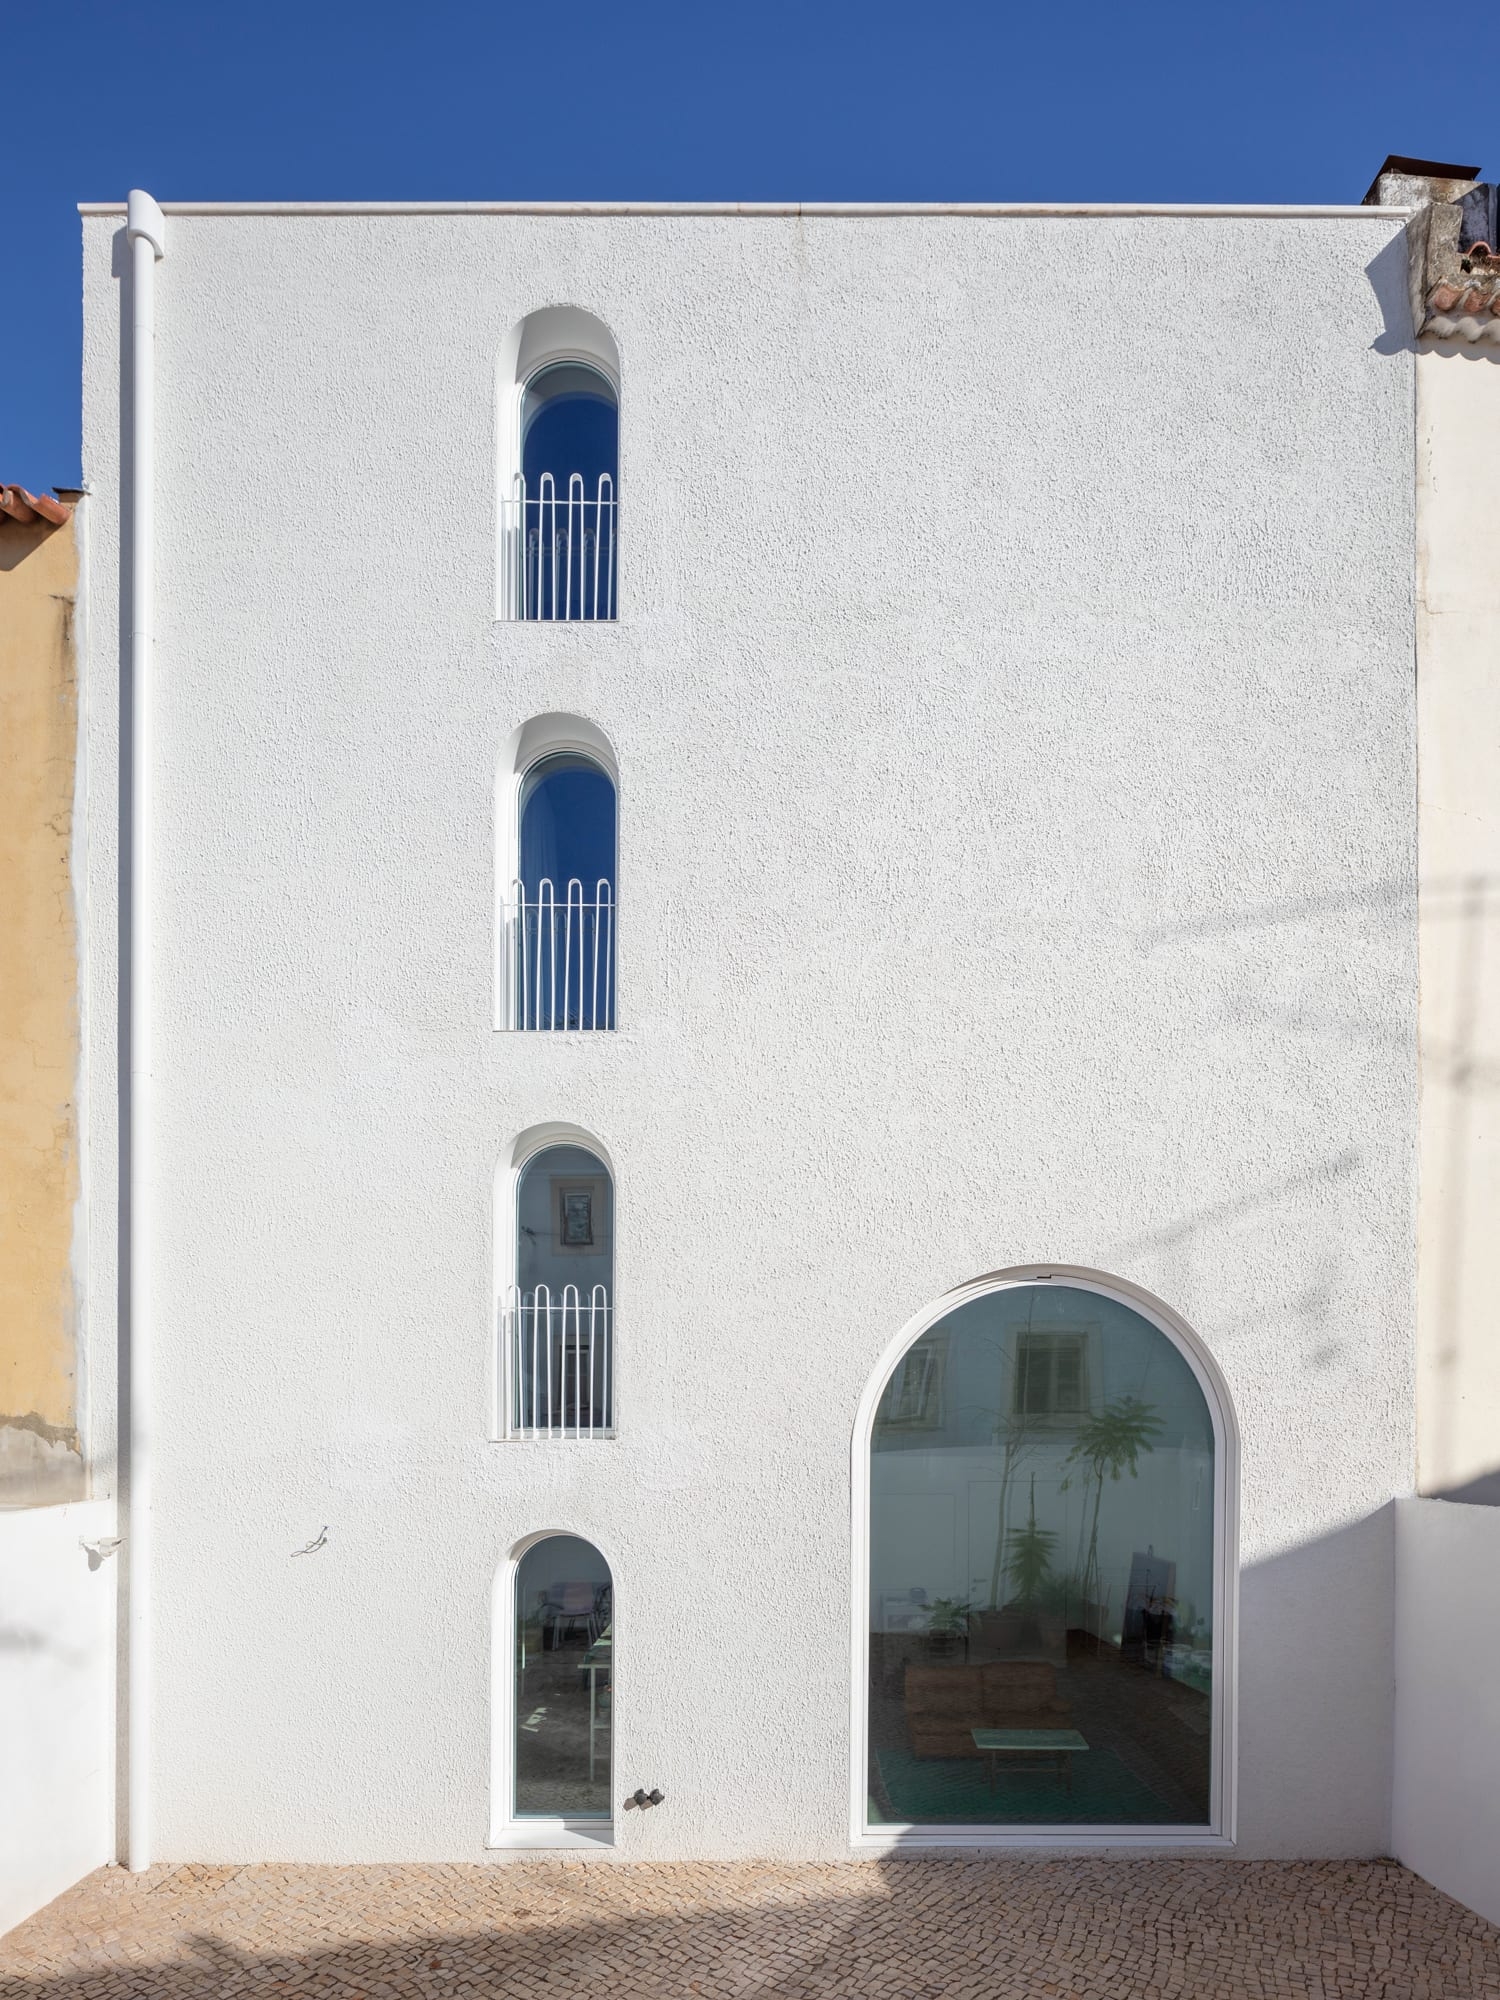 Dodged House In Lisbon By Leopold Banchini Daniel Zamarbide Yellowtrace 01